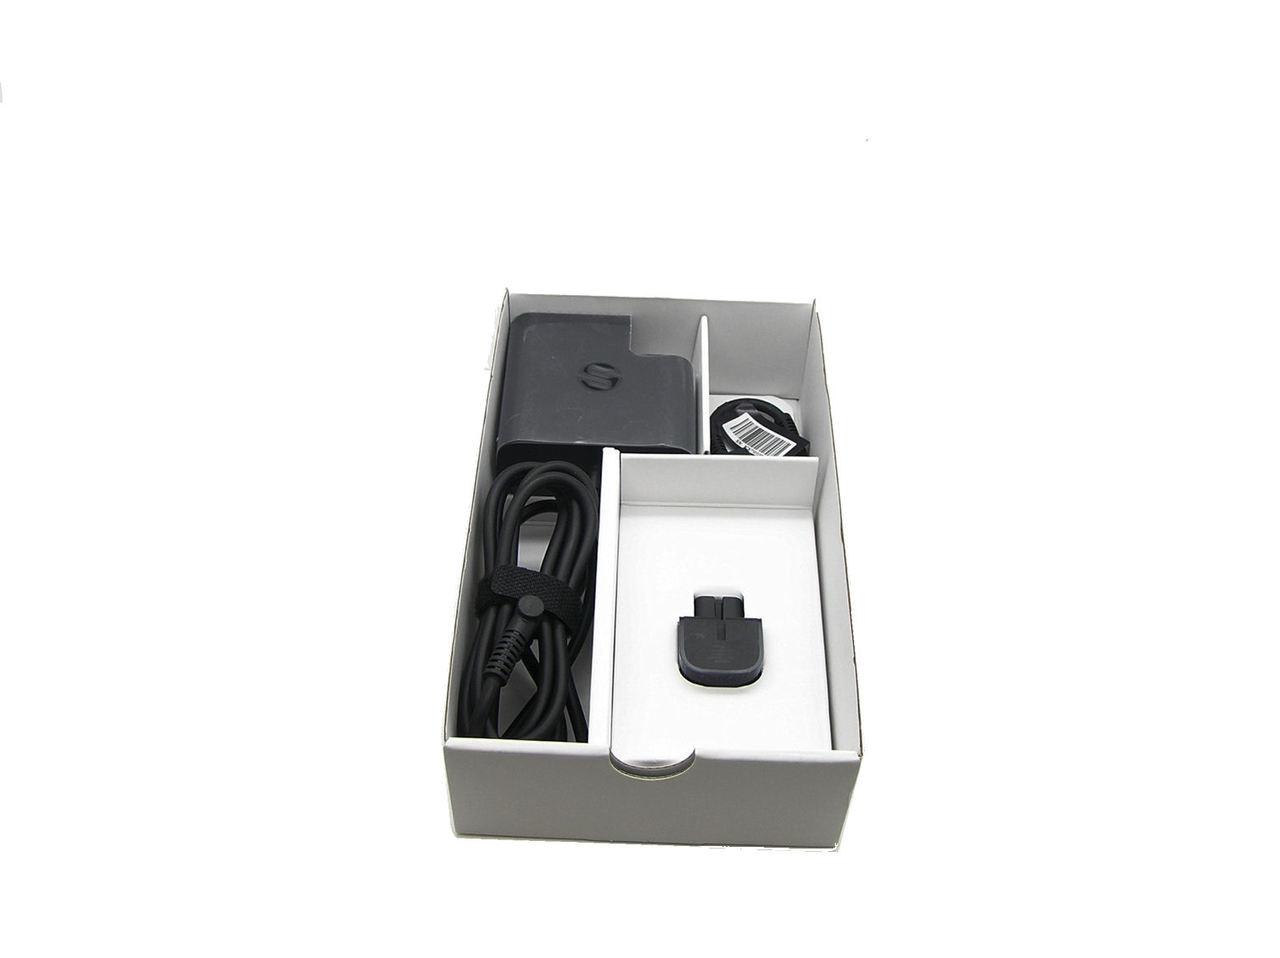 New Genuine HP 19.5V 3.33A 65W AC Adapter 1MY05AA 1MY05AA#ABA